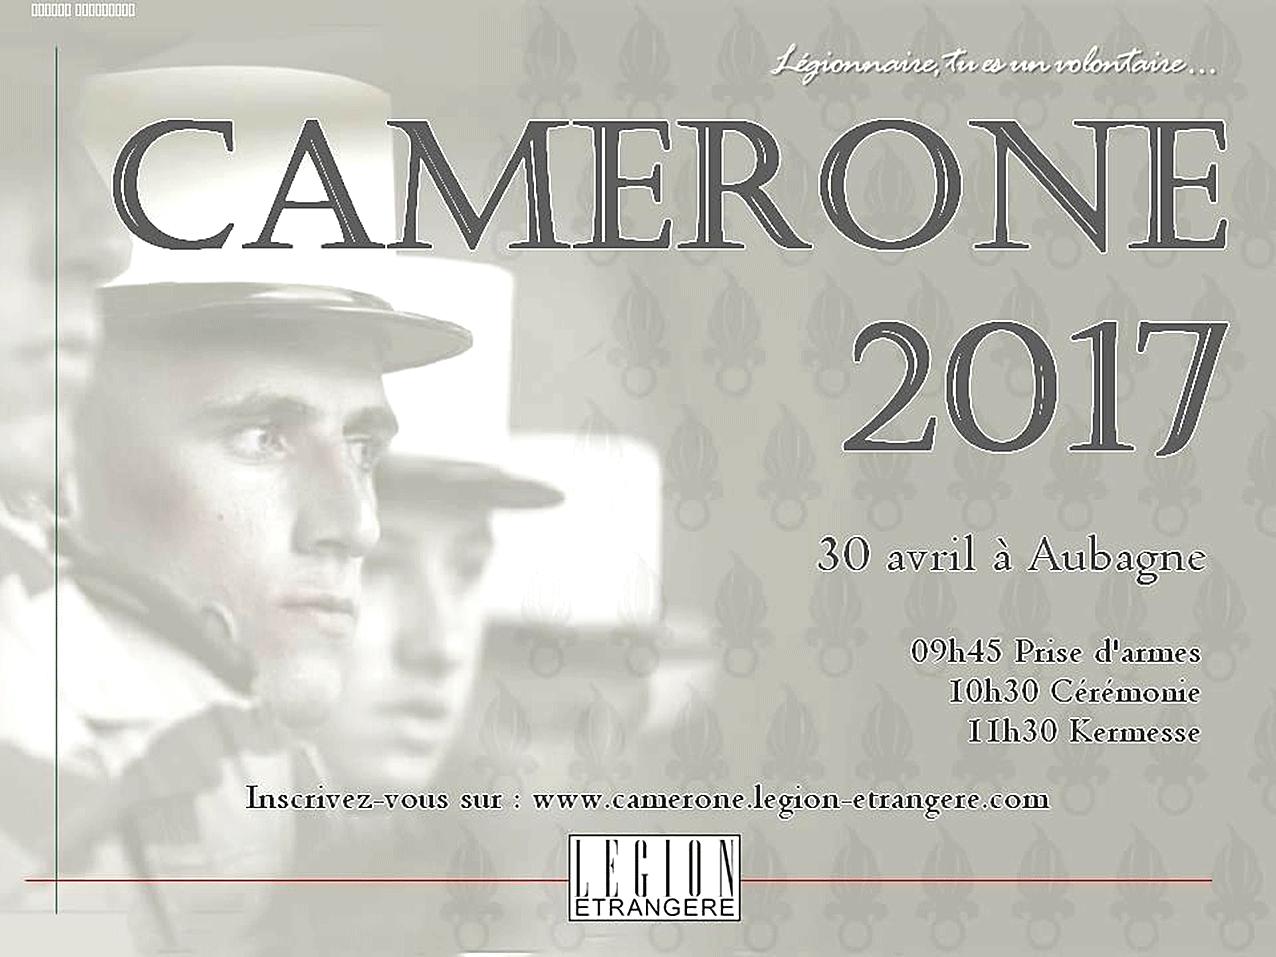 Camerone 2017